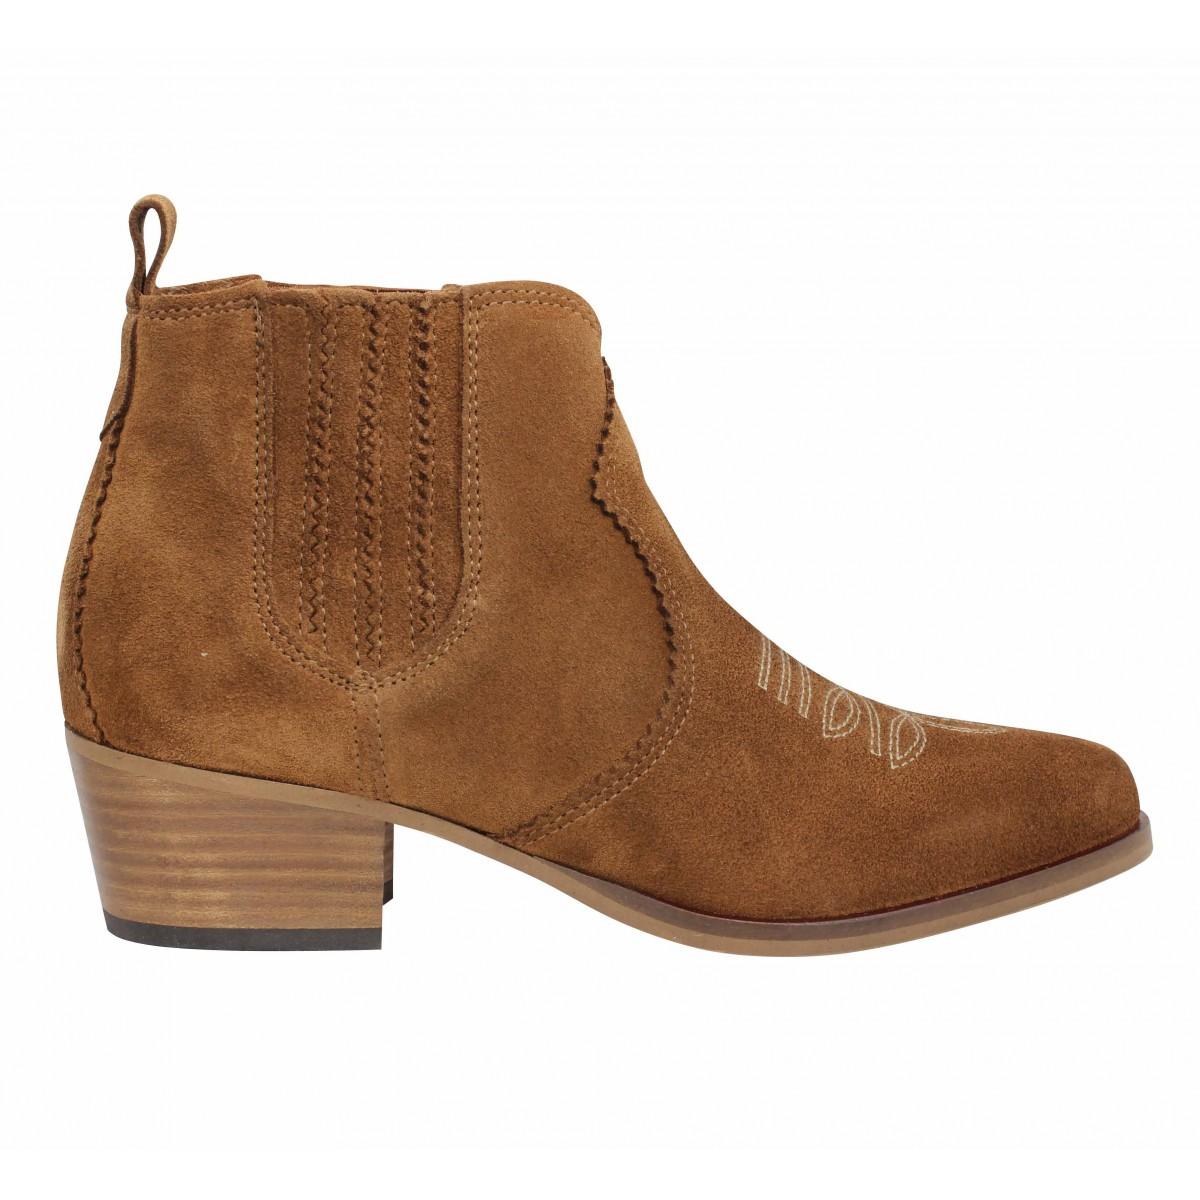 Femme Polly SCHMOOVE Cognac suede Boots EWD2HYI9